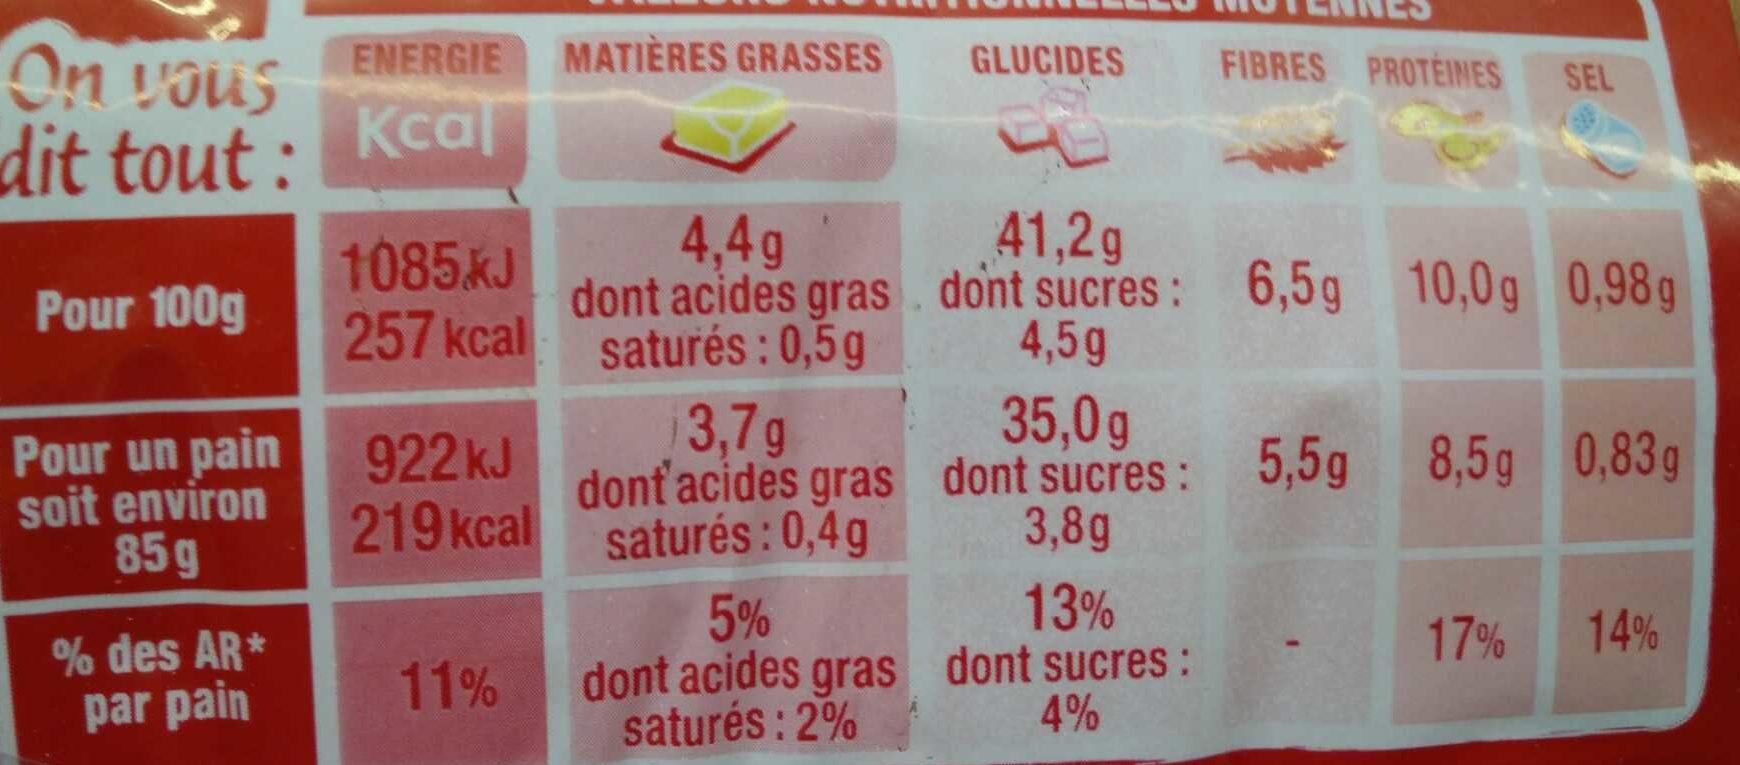 Burger céréales et graines - Voedingswaarden - fr